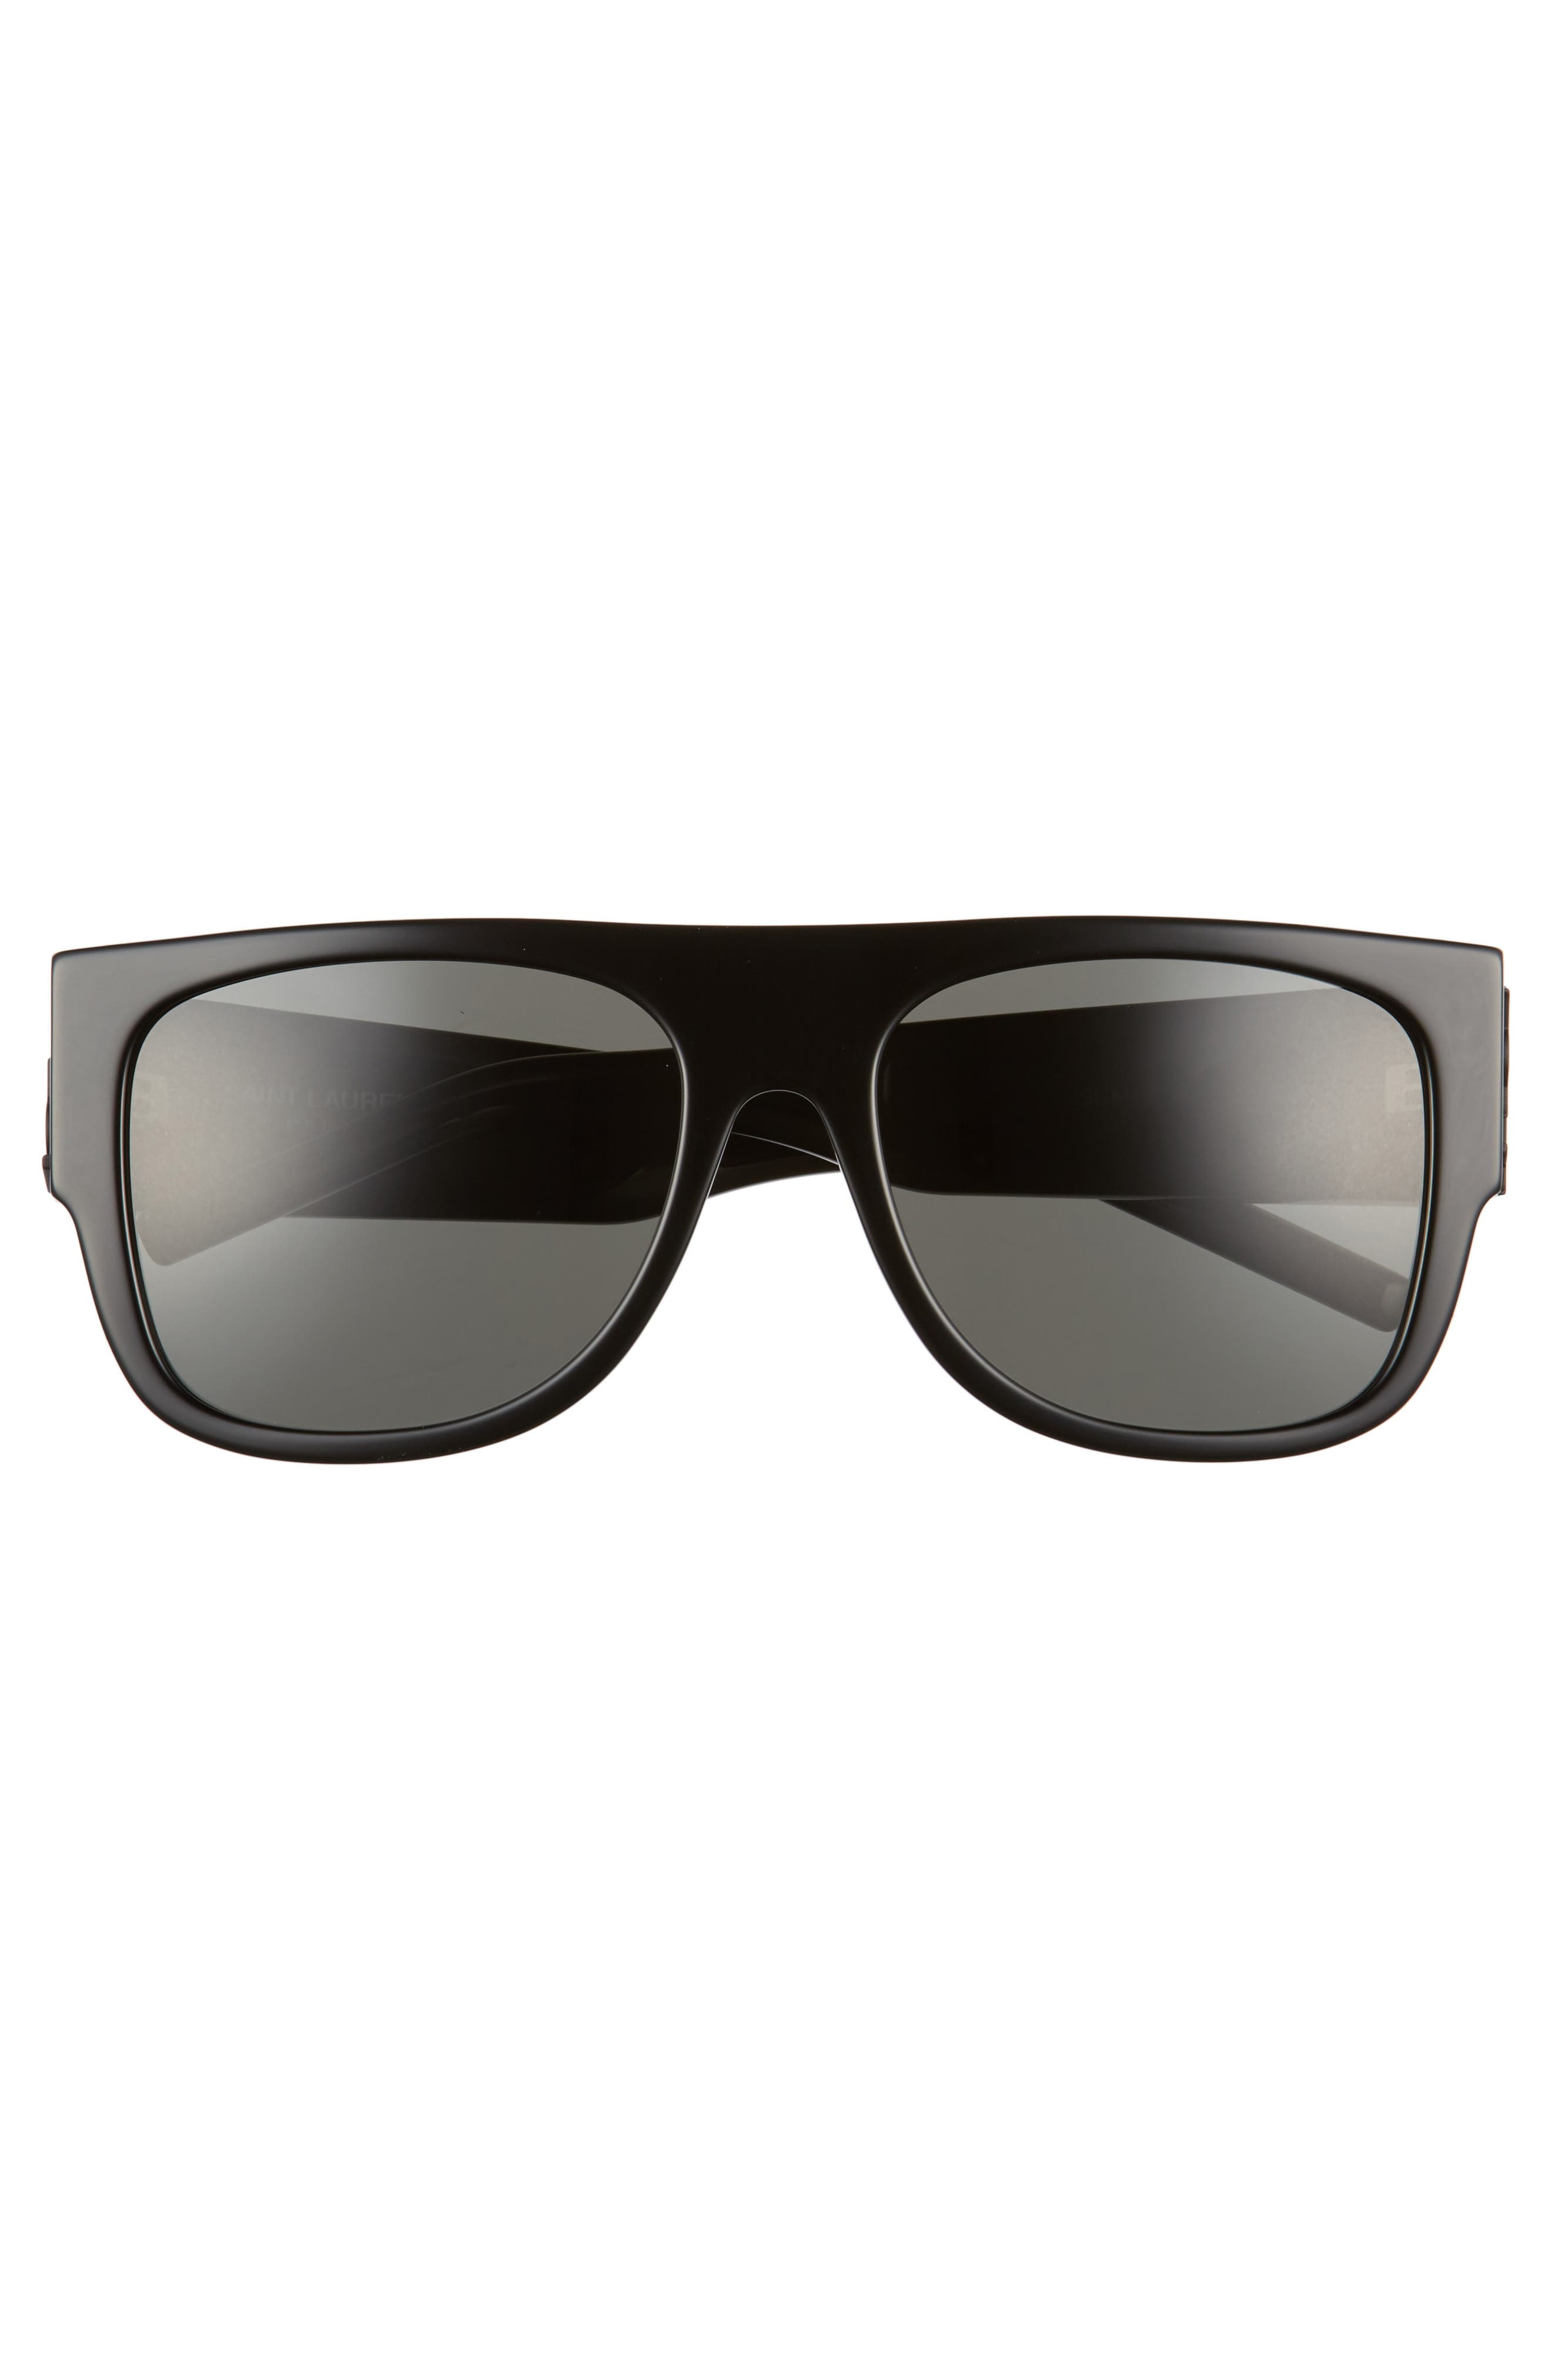 SL M16 55mm Flat Top Sunglasses,                             Alternate thumbnail 3, color,                             001